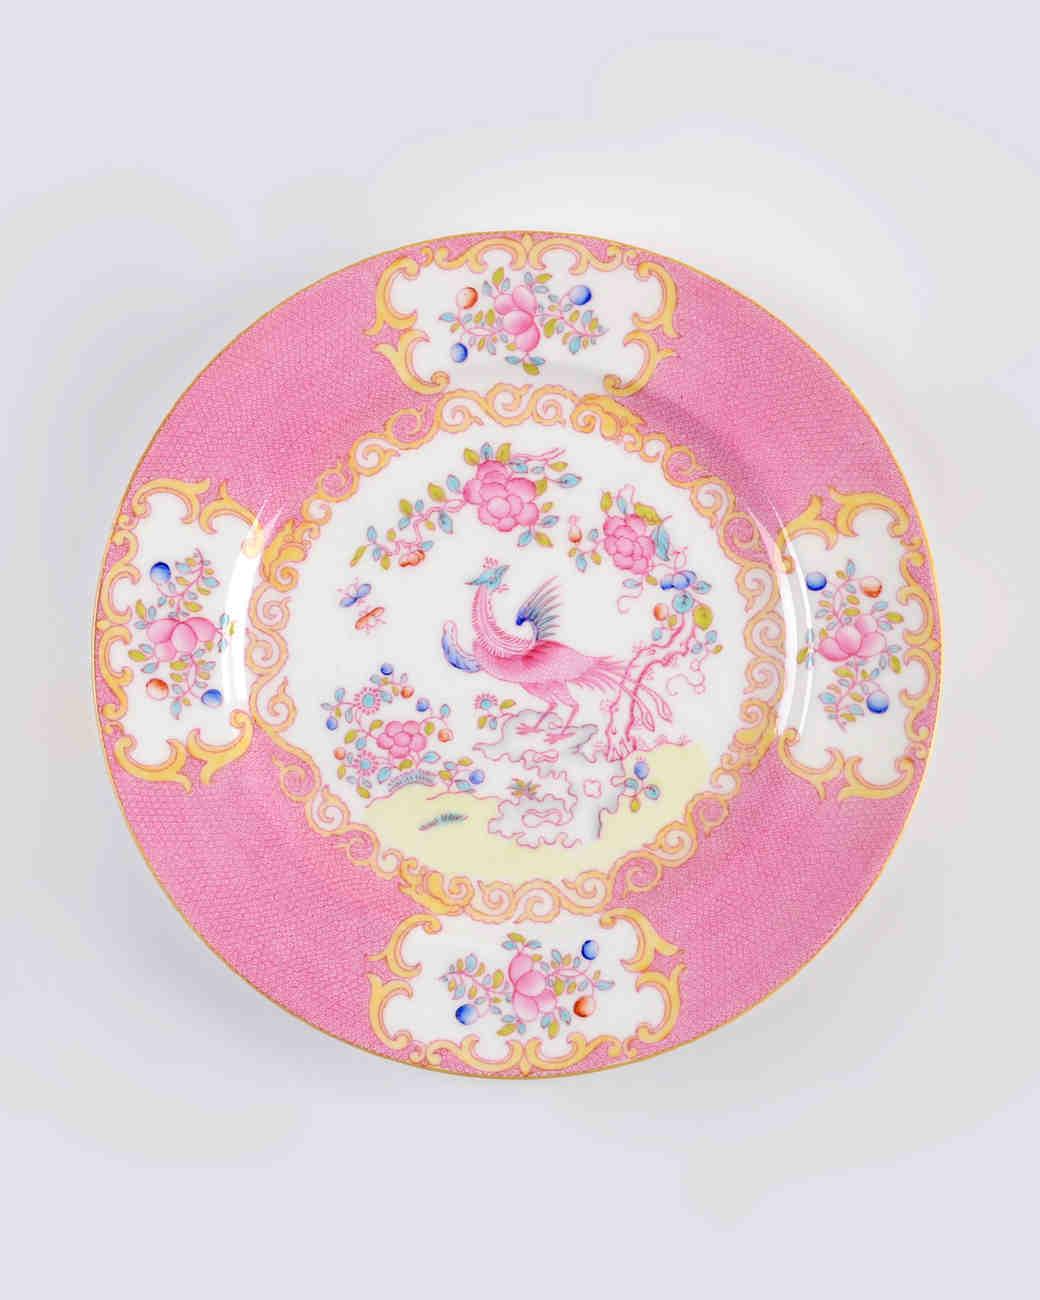 china-registry-vintage-charm-minton-cockatrice-pink-1014.jpg